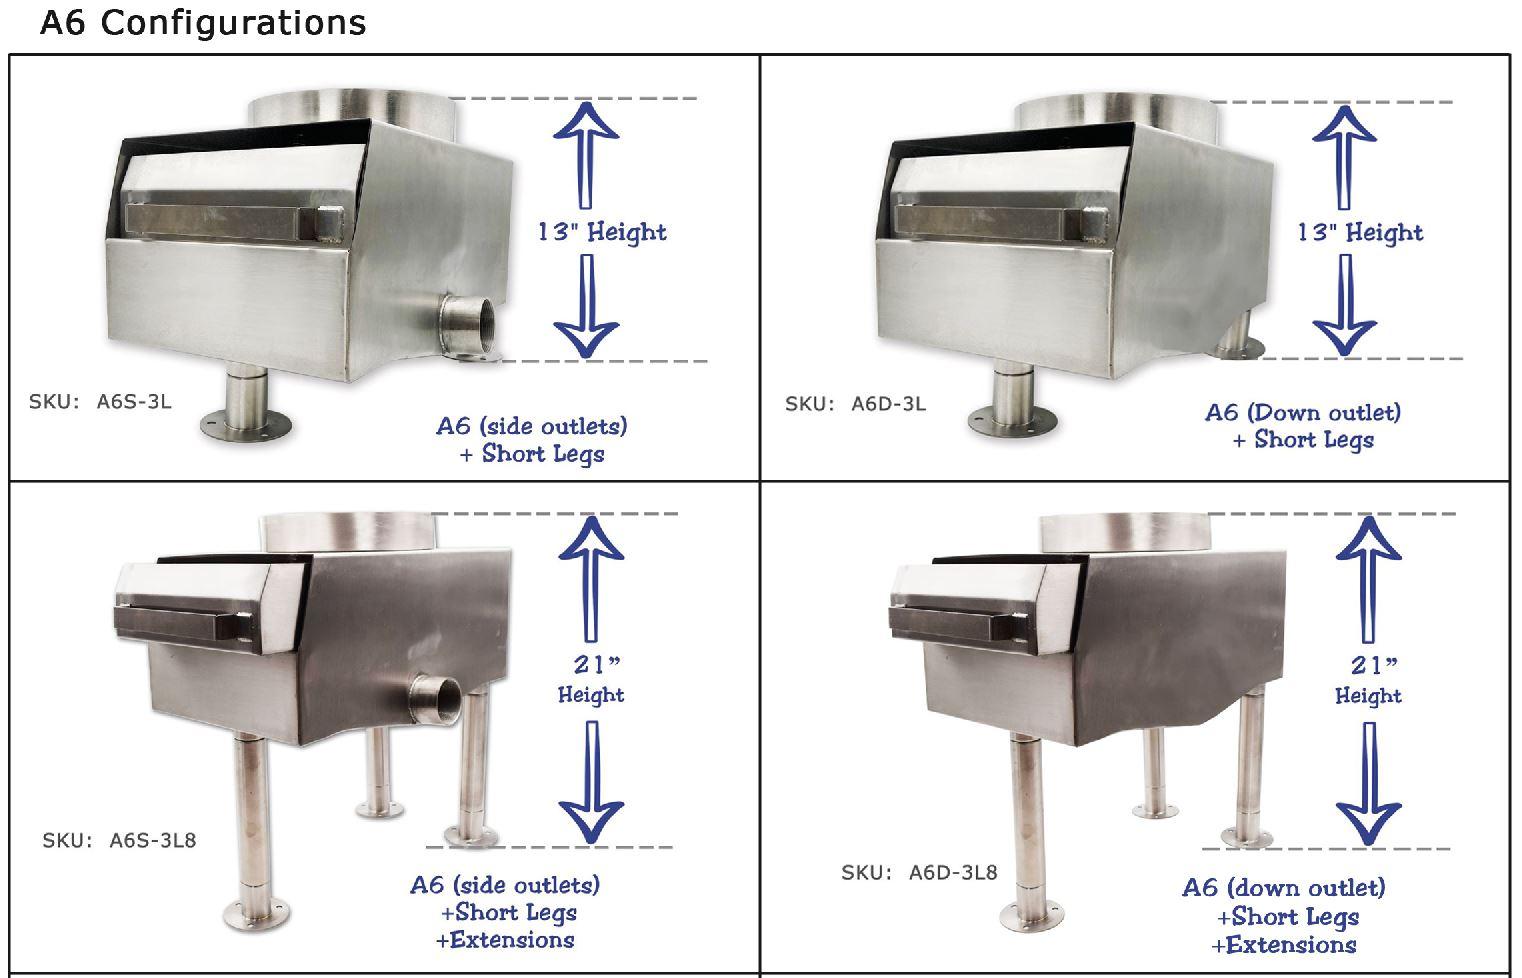 a6-configurations-1.jpg